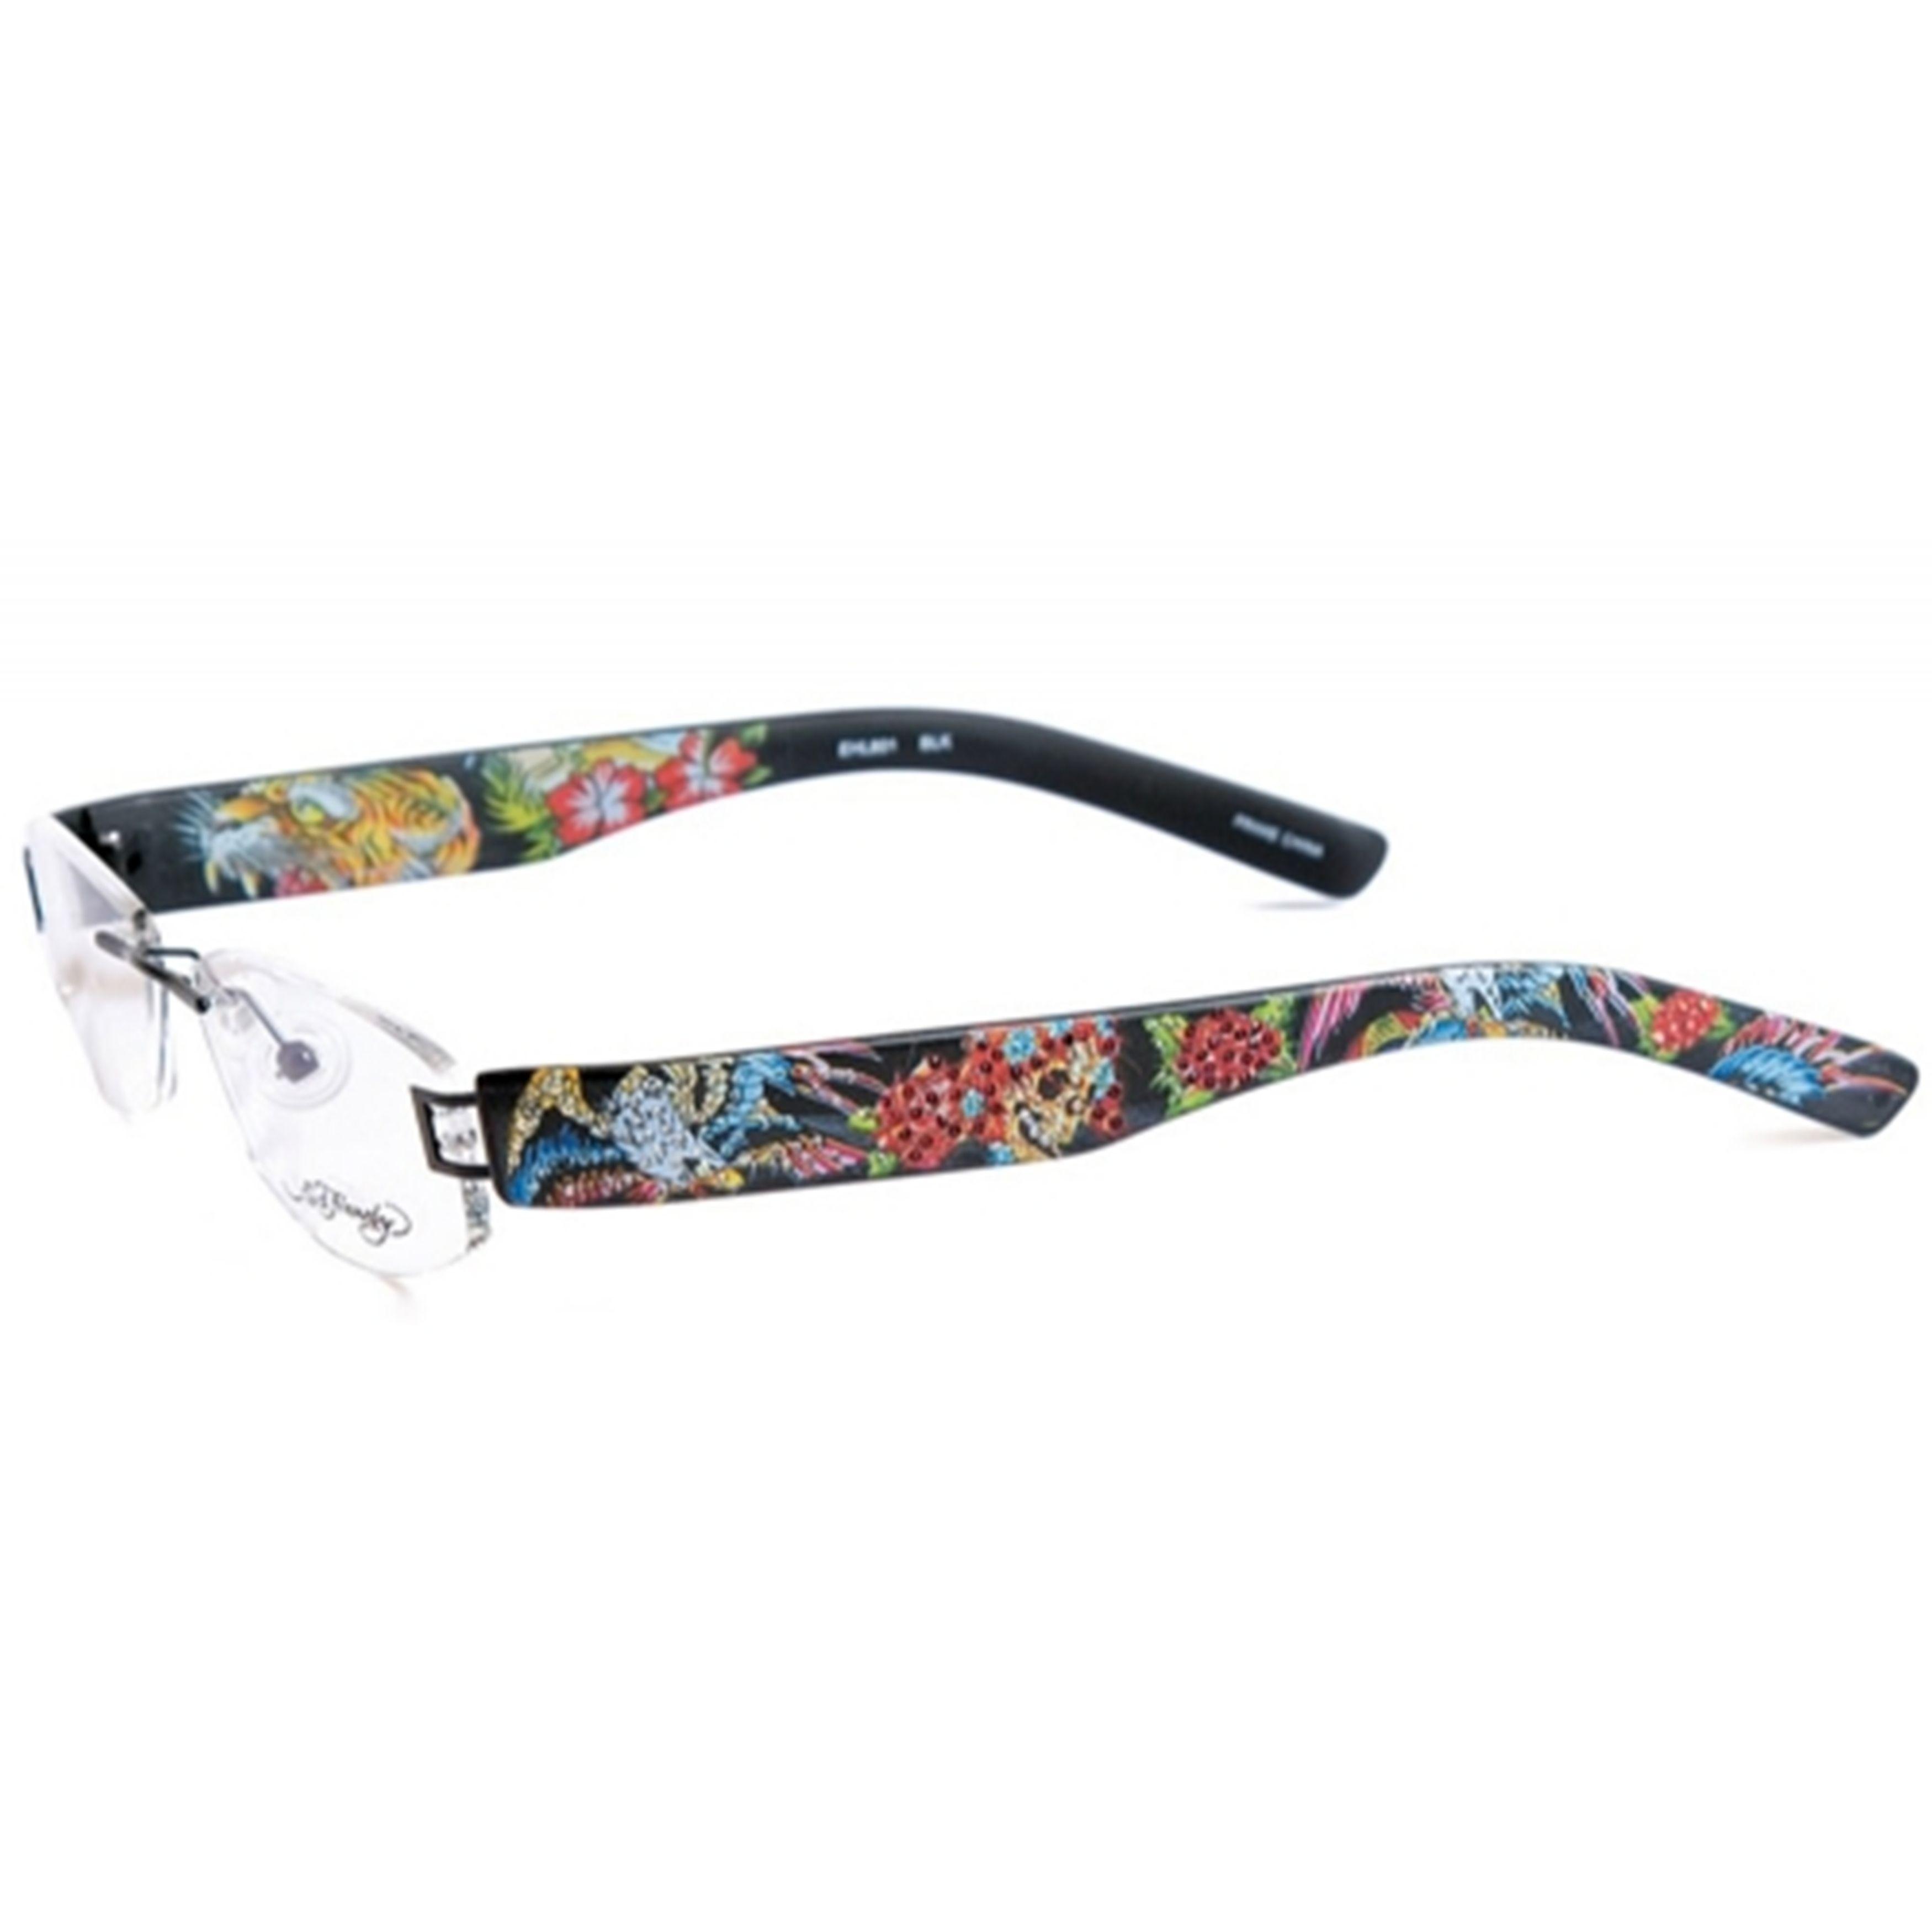 c935331045 Ed Hardy EHL-801 Adult s Lite Designer Eyeglasses